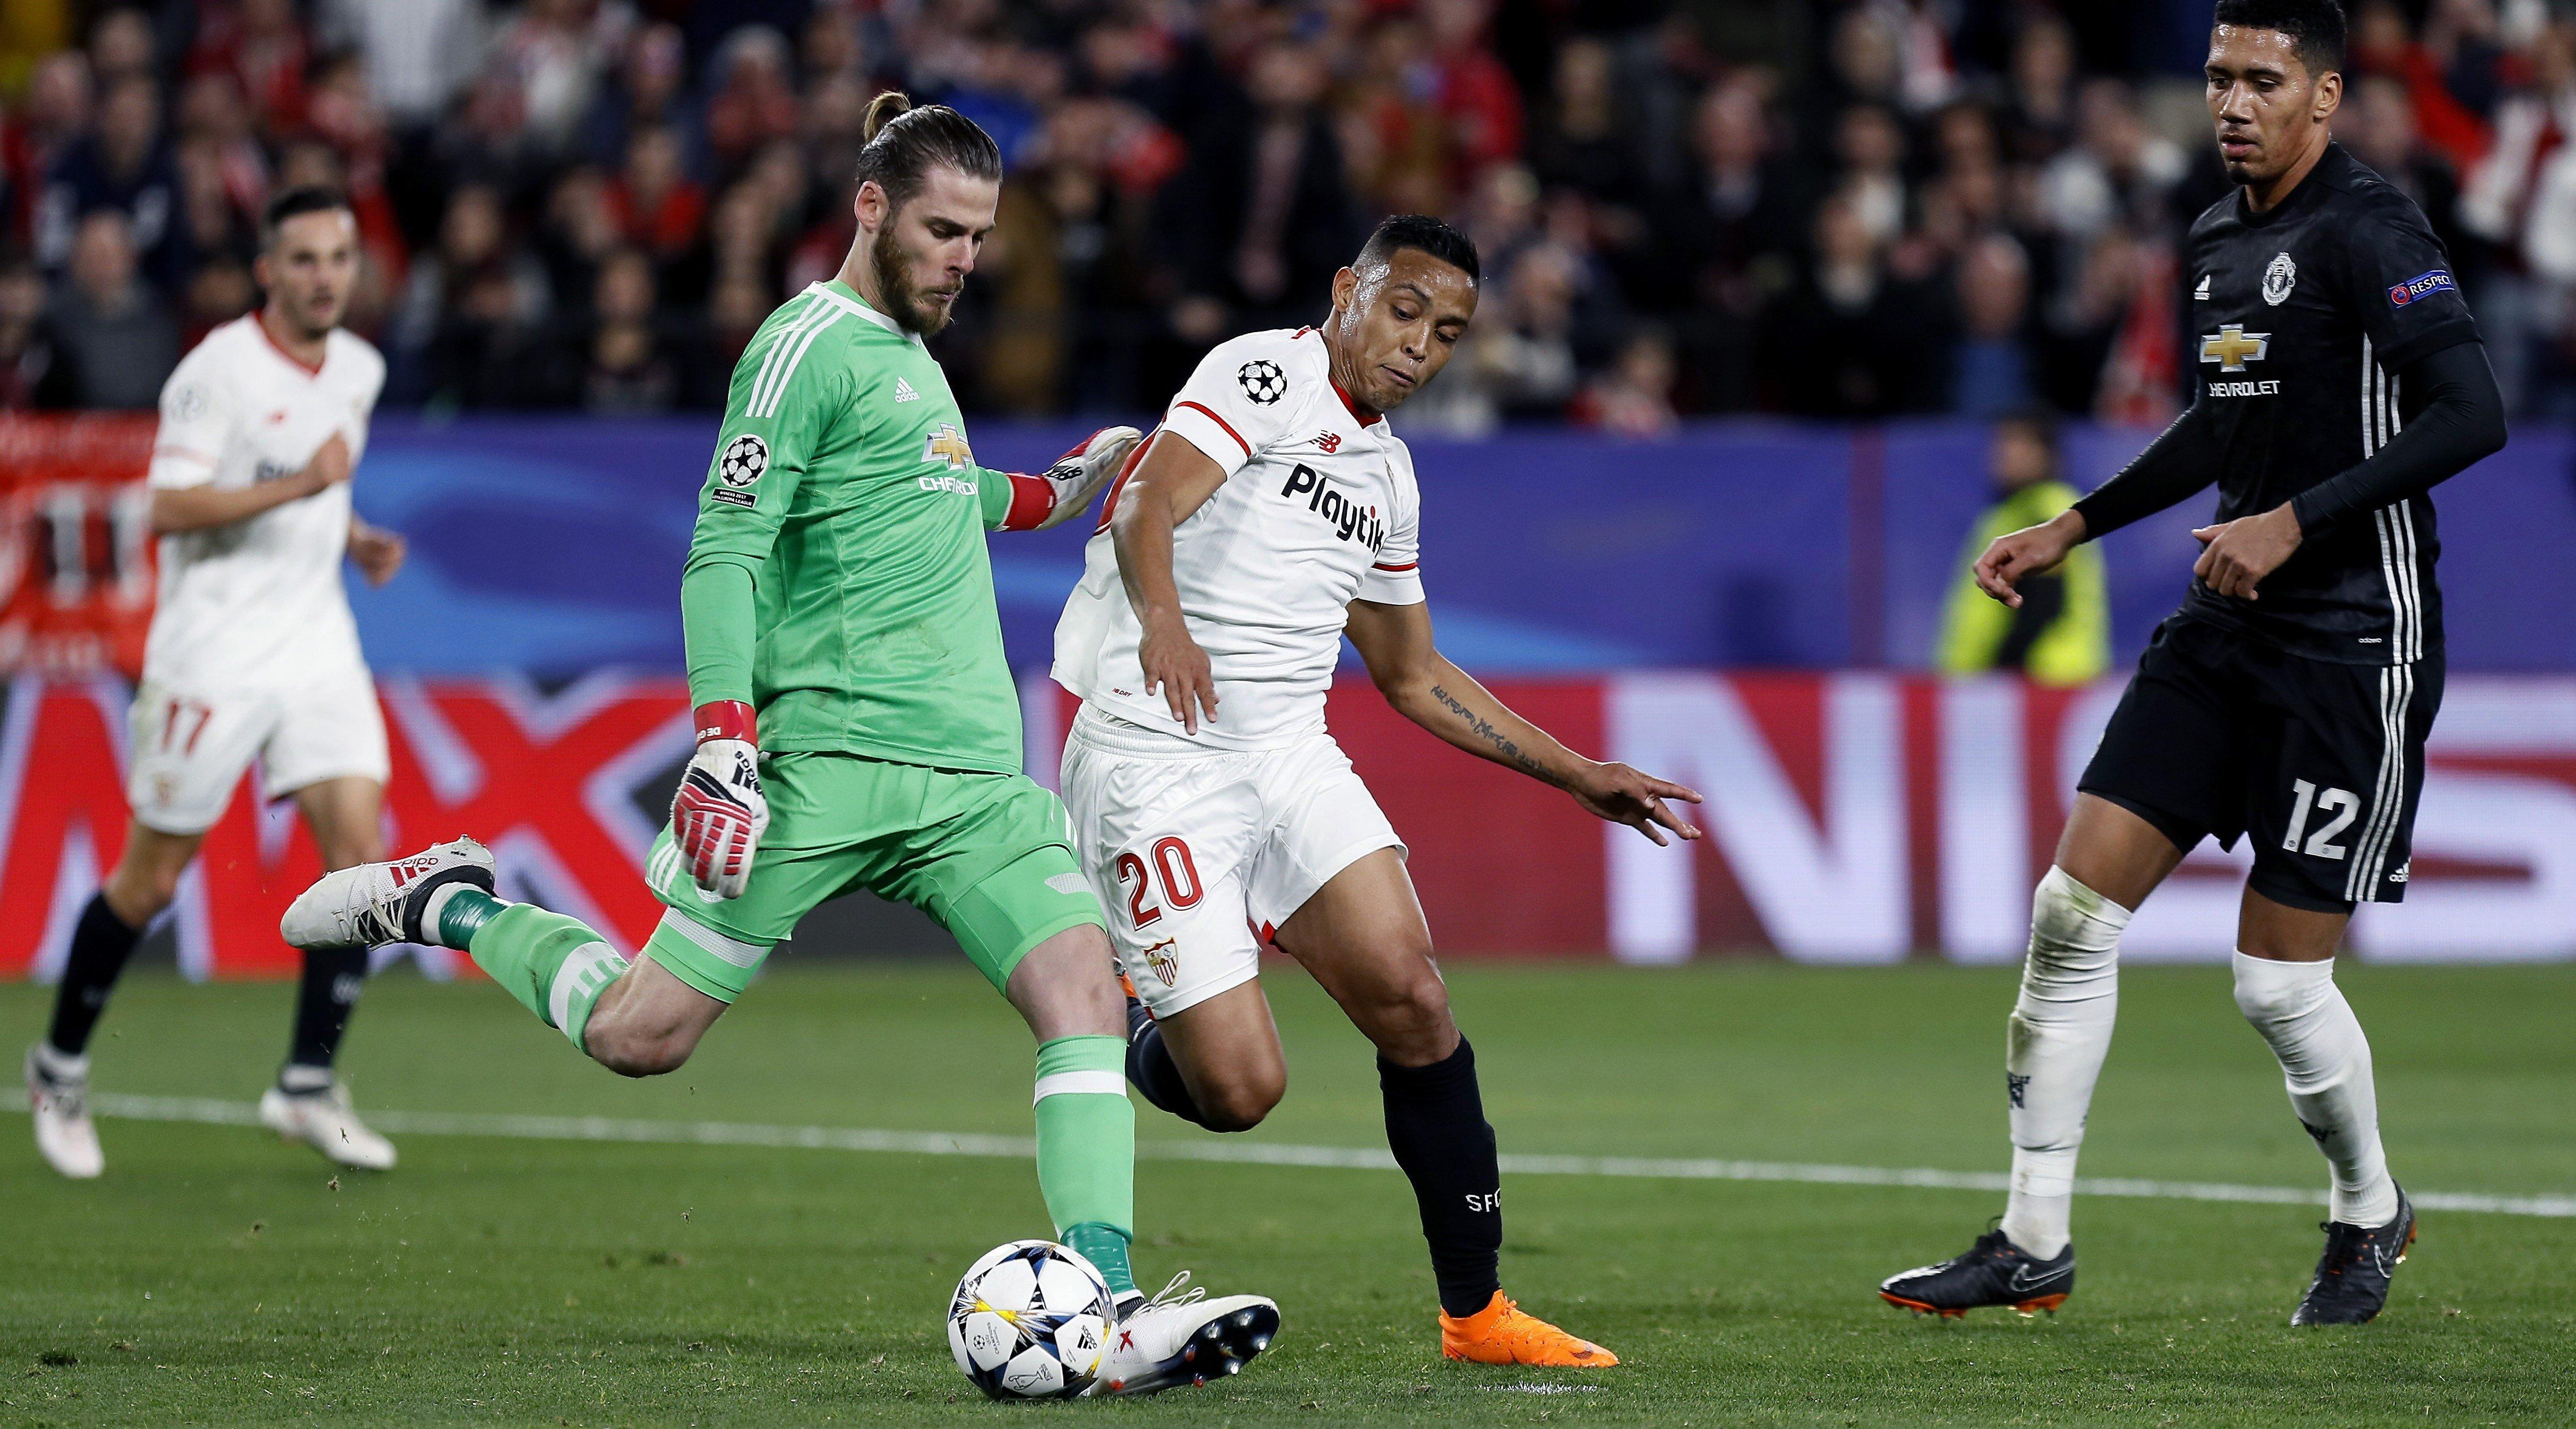 De Gea Muriel Sevilla Manchester United Efe